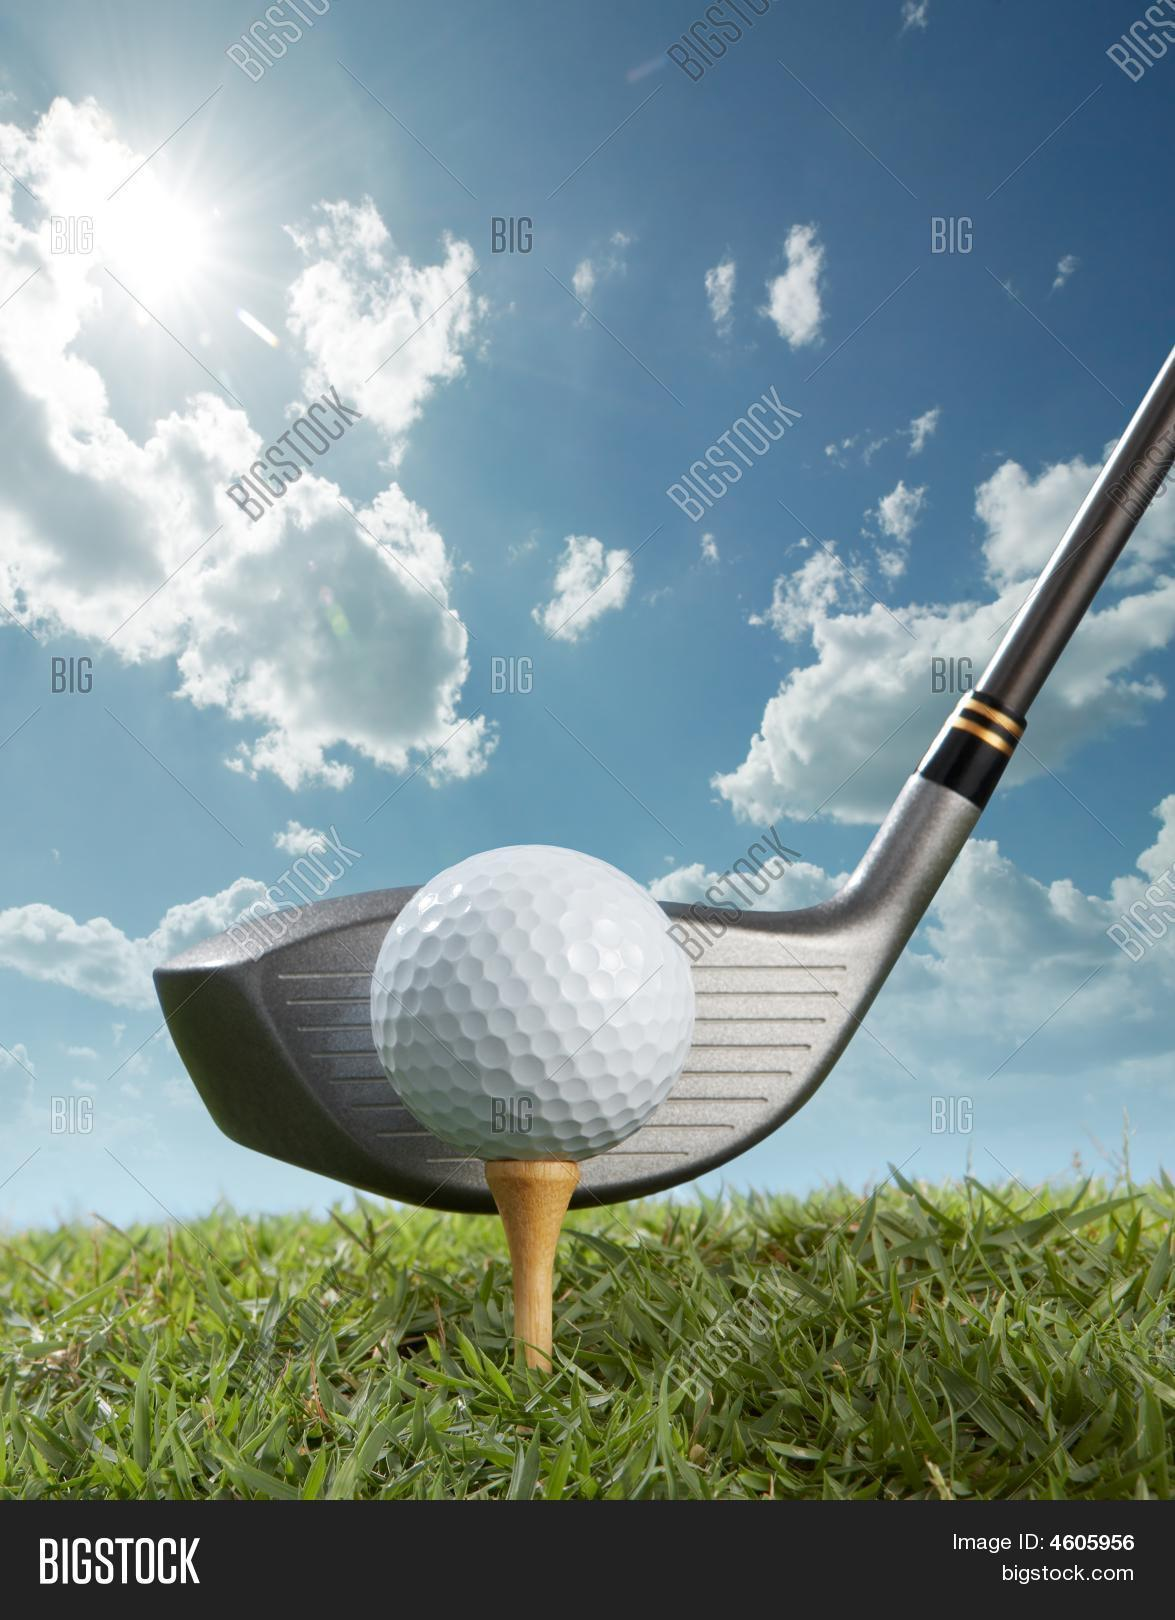 ball,close,close up,detail,driver,golf,grass,leisure,outdoor,recreation,sky,sport,sunny,tee